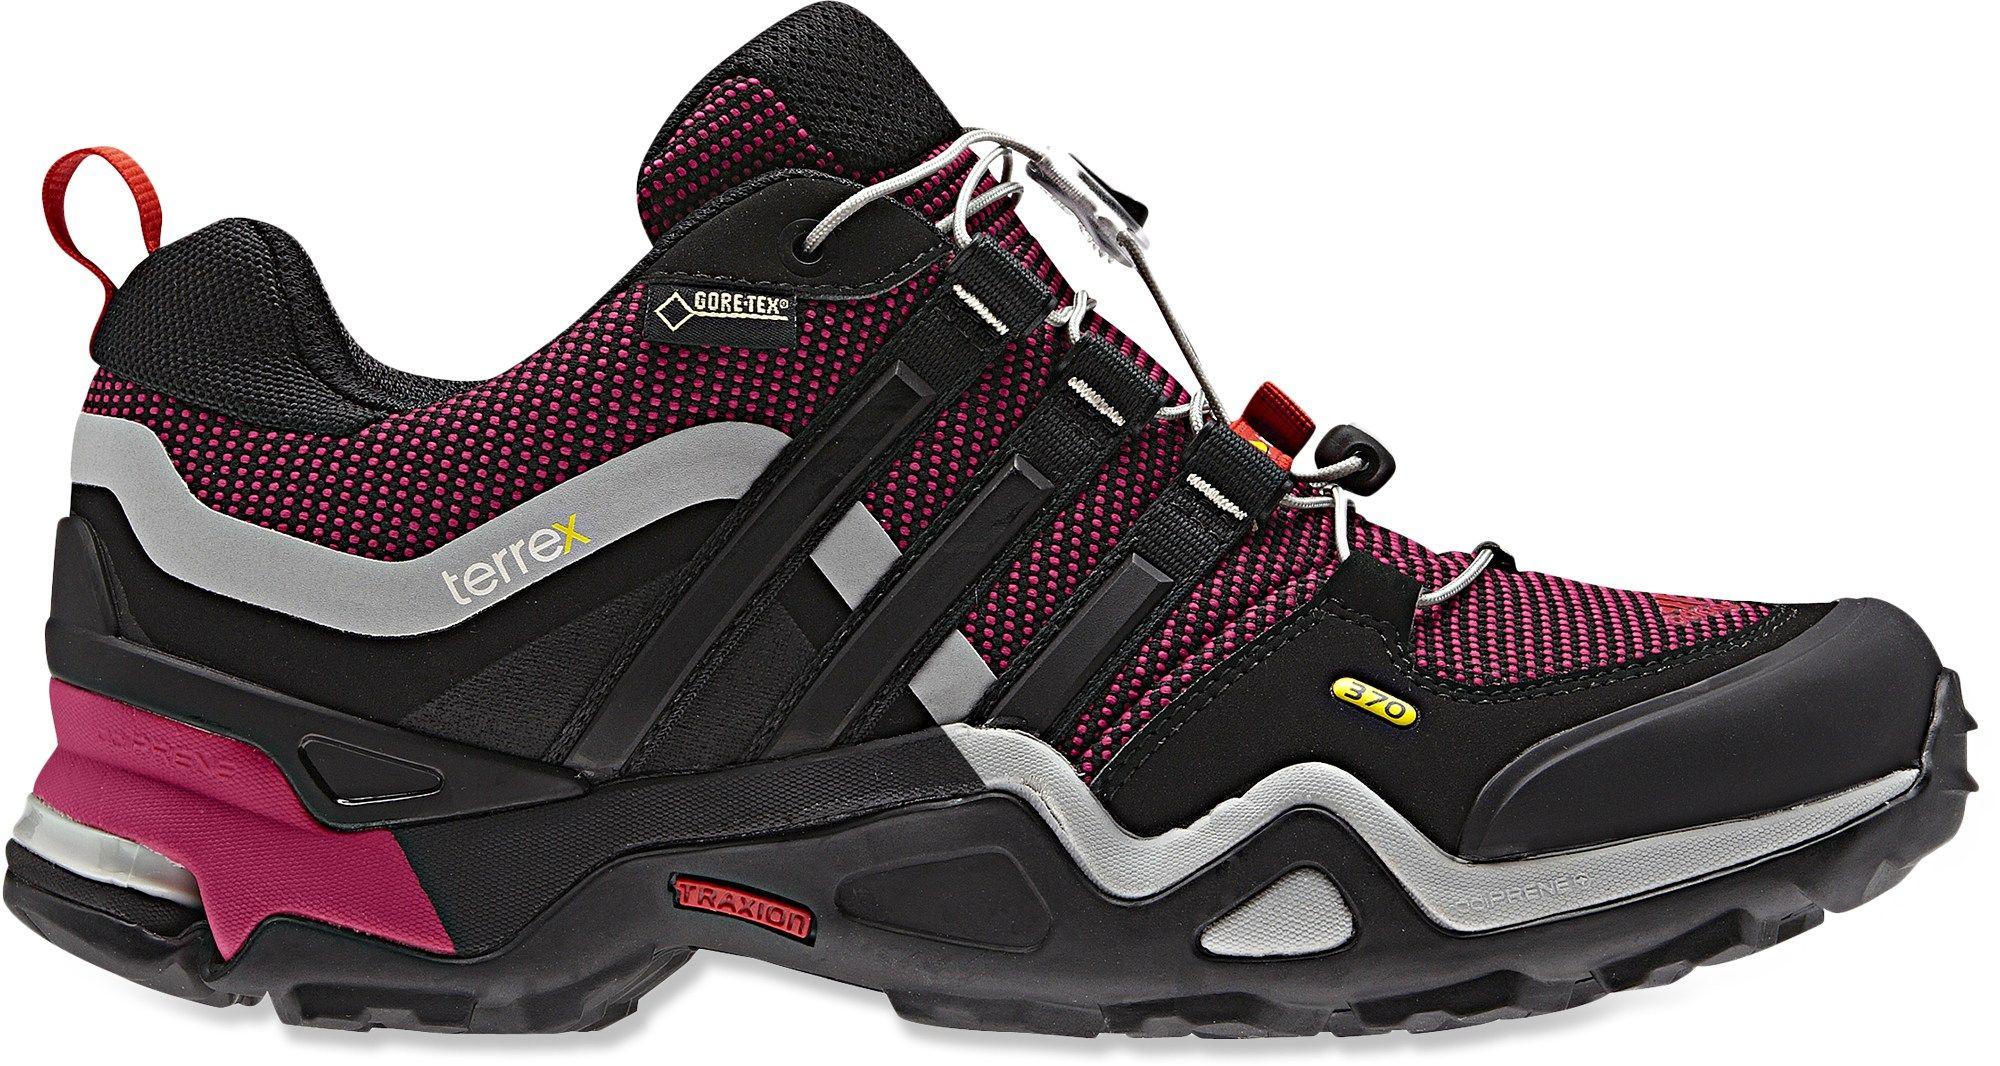 wholesale dealer 81eaa 60af4 adidas Terrex Fast X Low GTX Hiking Shoes - Women's | REI Co ...